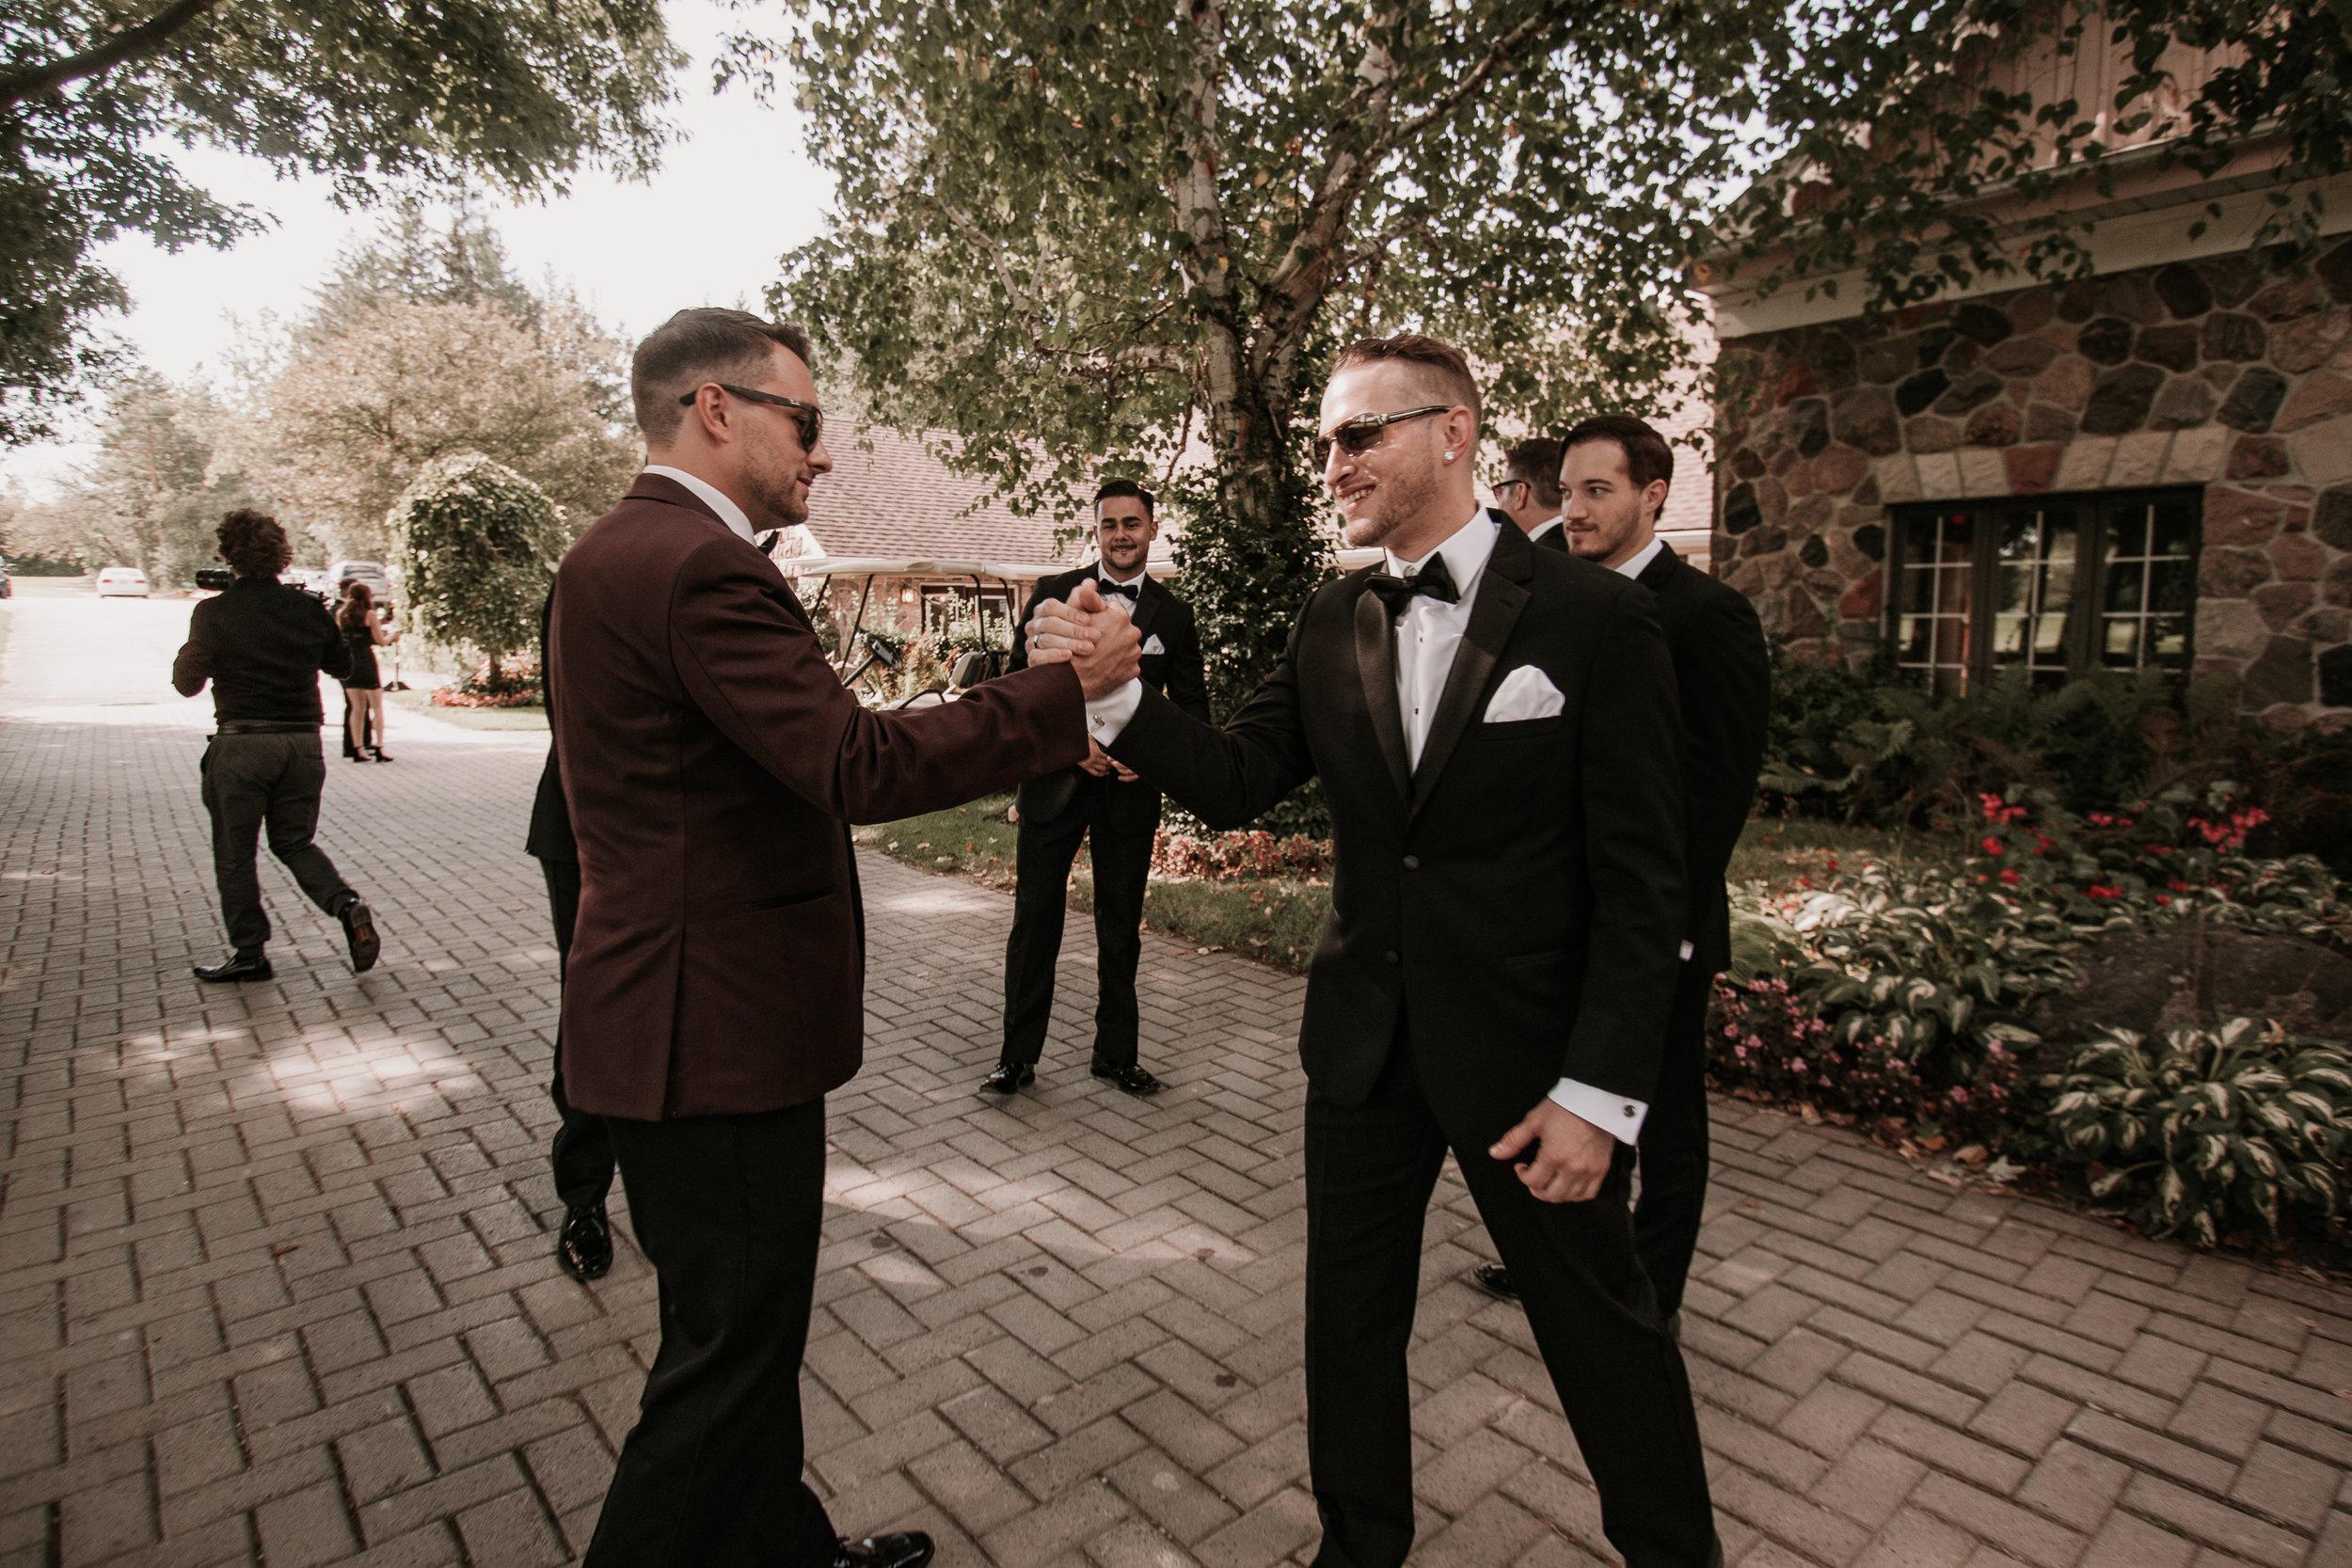 Claremont_fourseasons_Wedding-82.jpg